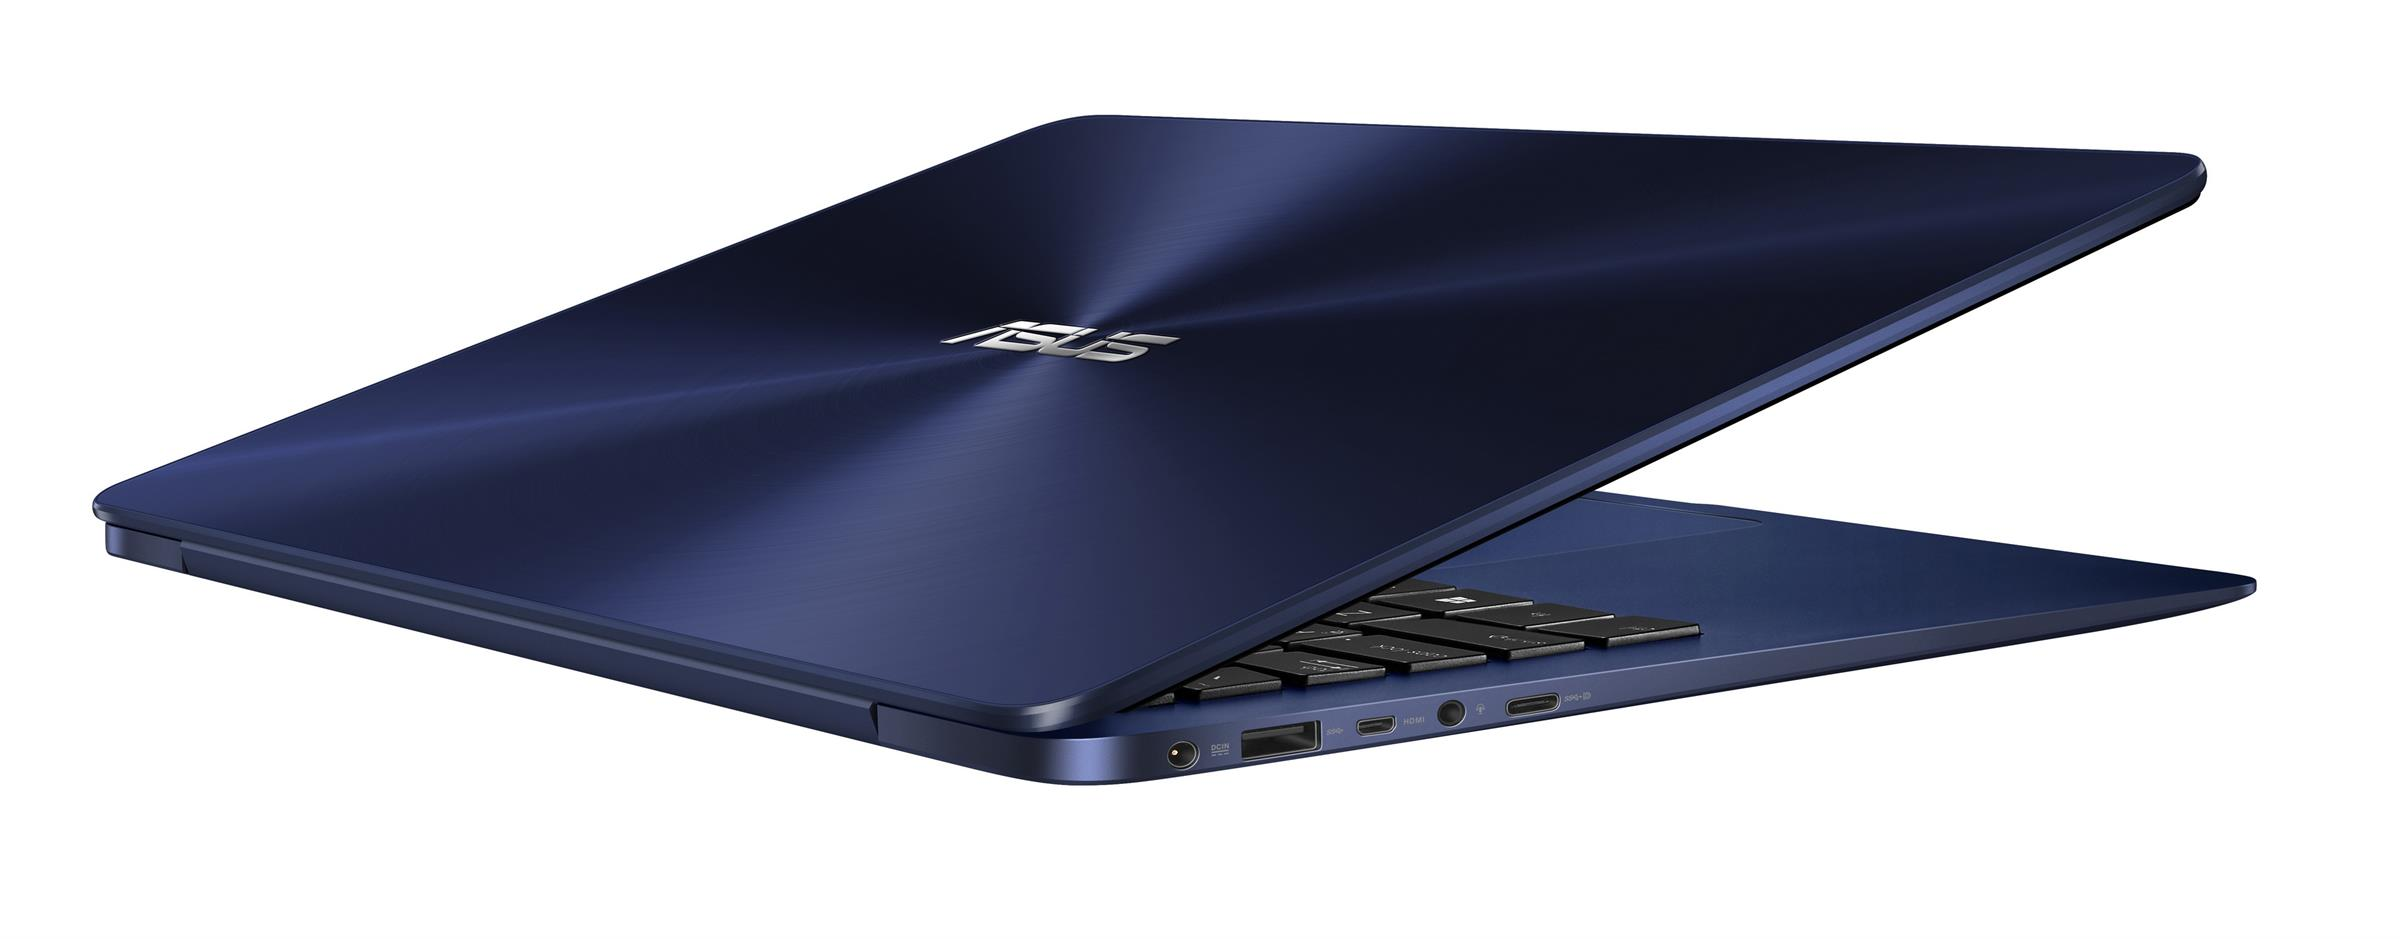 Prenosni računalnik UX430UA-GV334T I5/8G ASUS 8250U/256G/UMA/W10